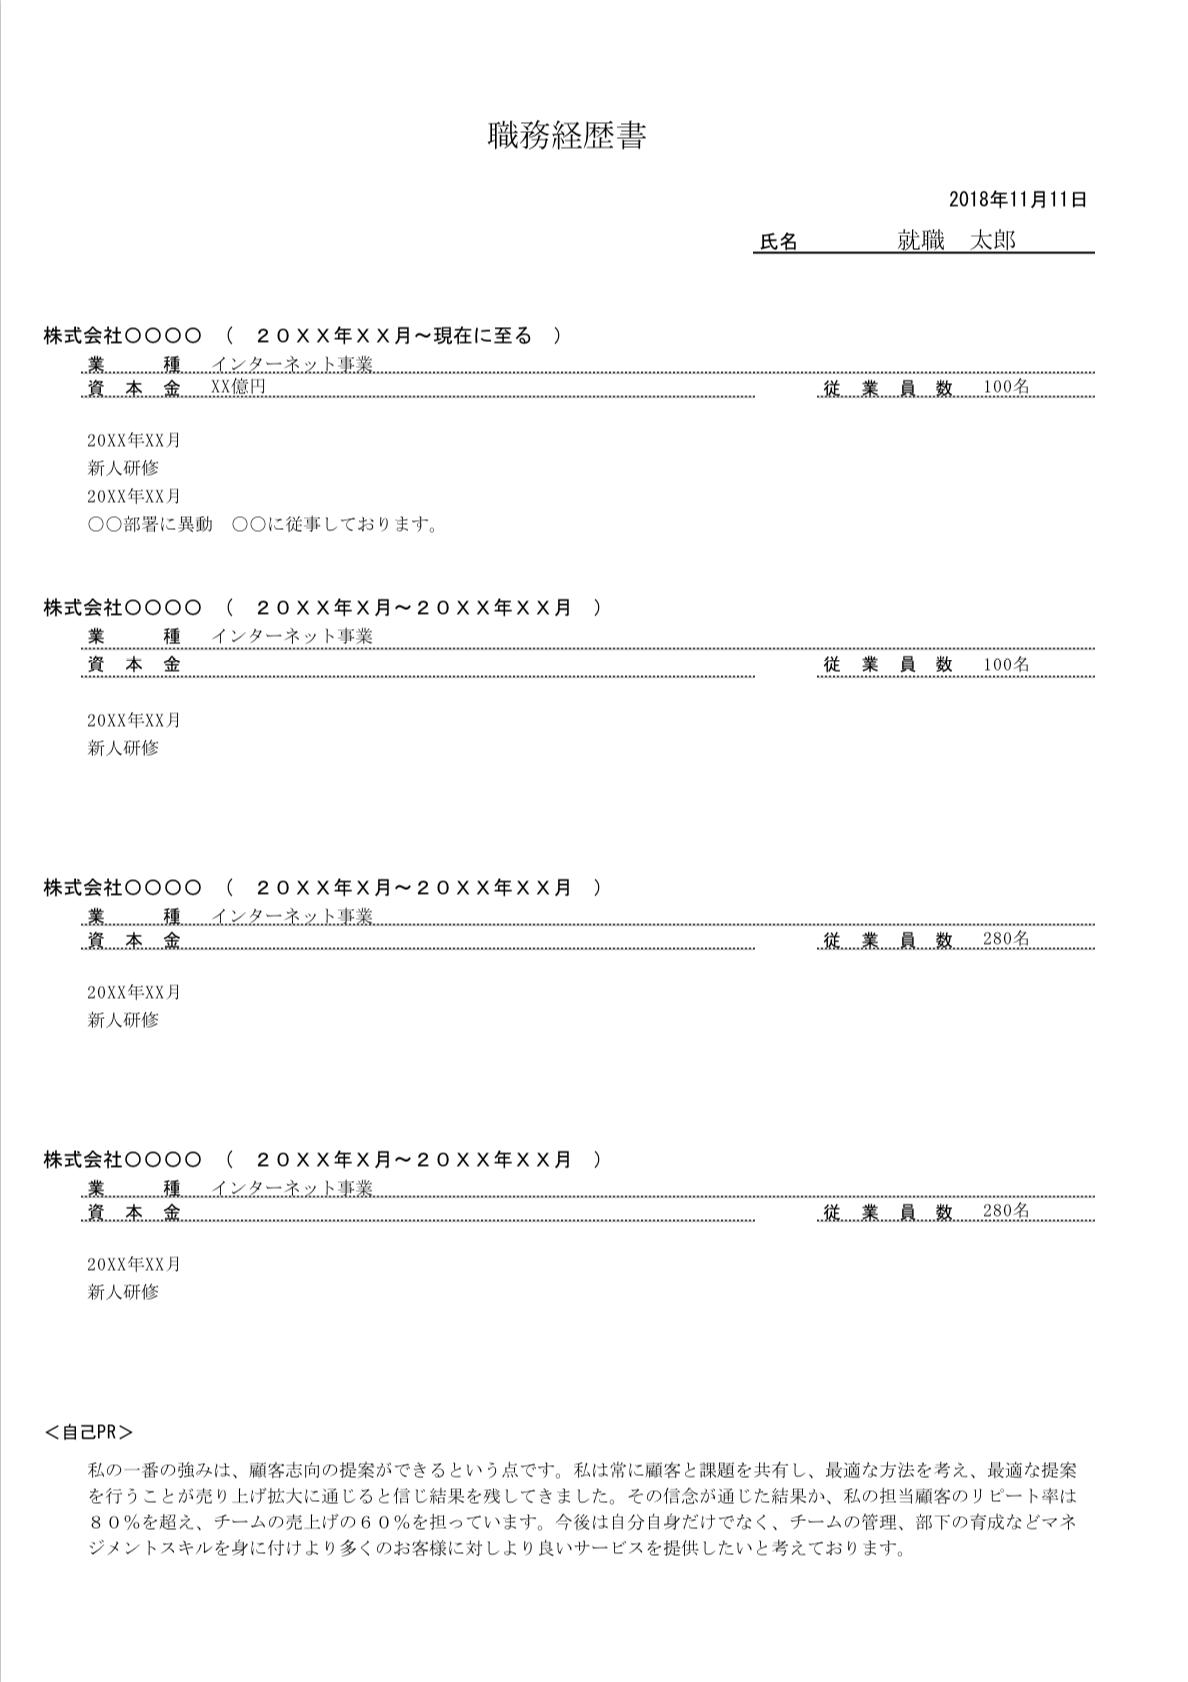 MAC用の書き込める履歴書テンプレートがあるサイ …